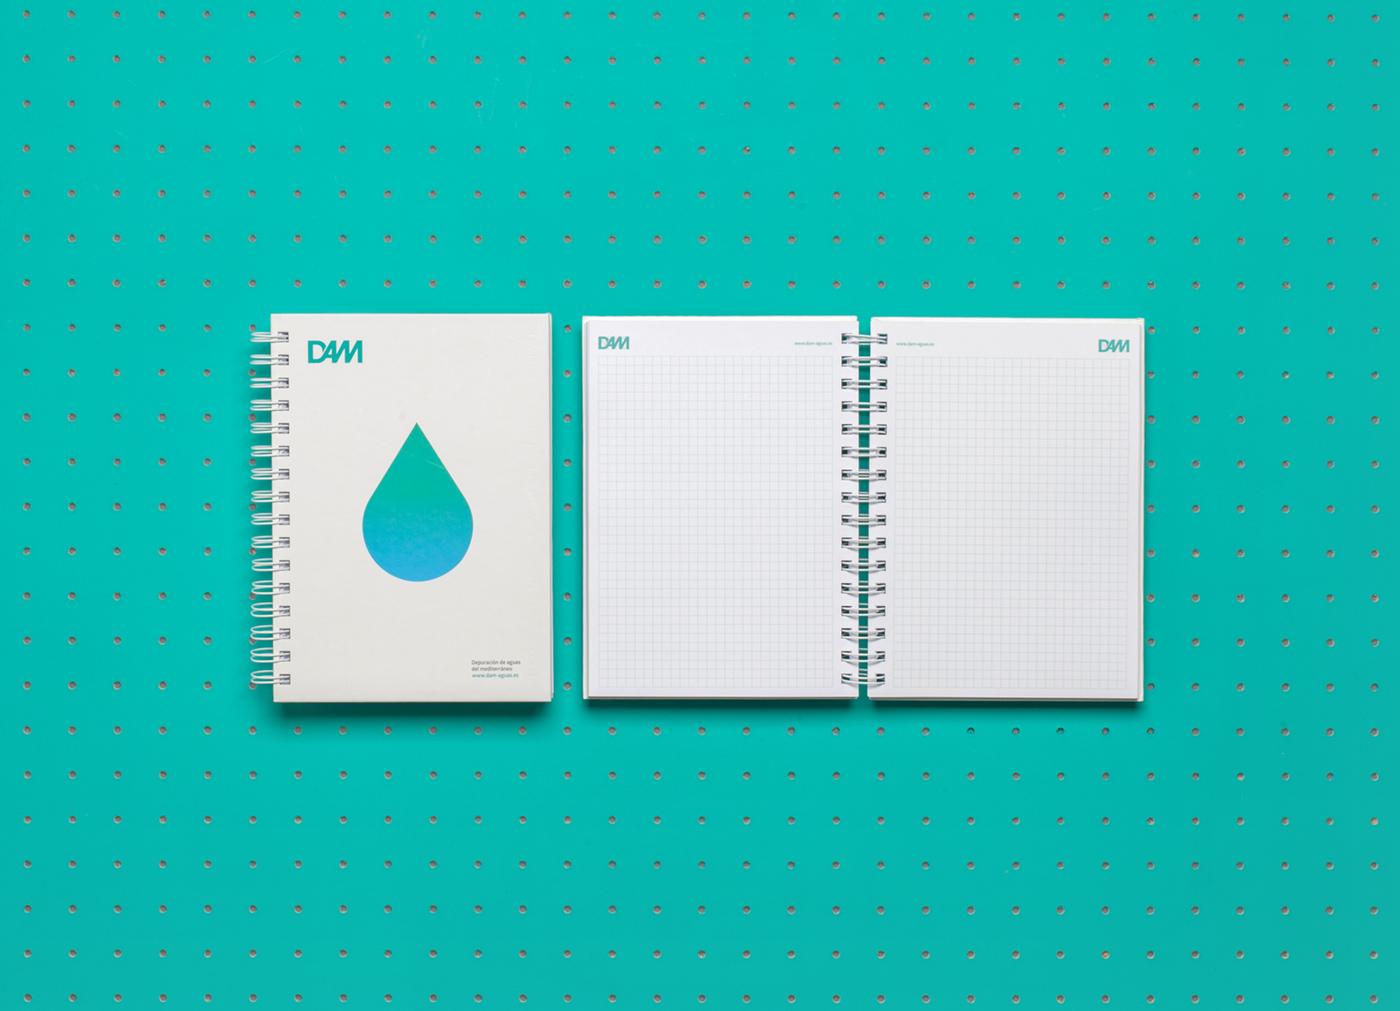 pixelarte-diseno-grafico-papeleria-libretas-Dam_Depuracion_Aguas_Mediterraneo